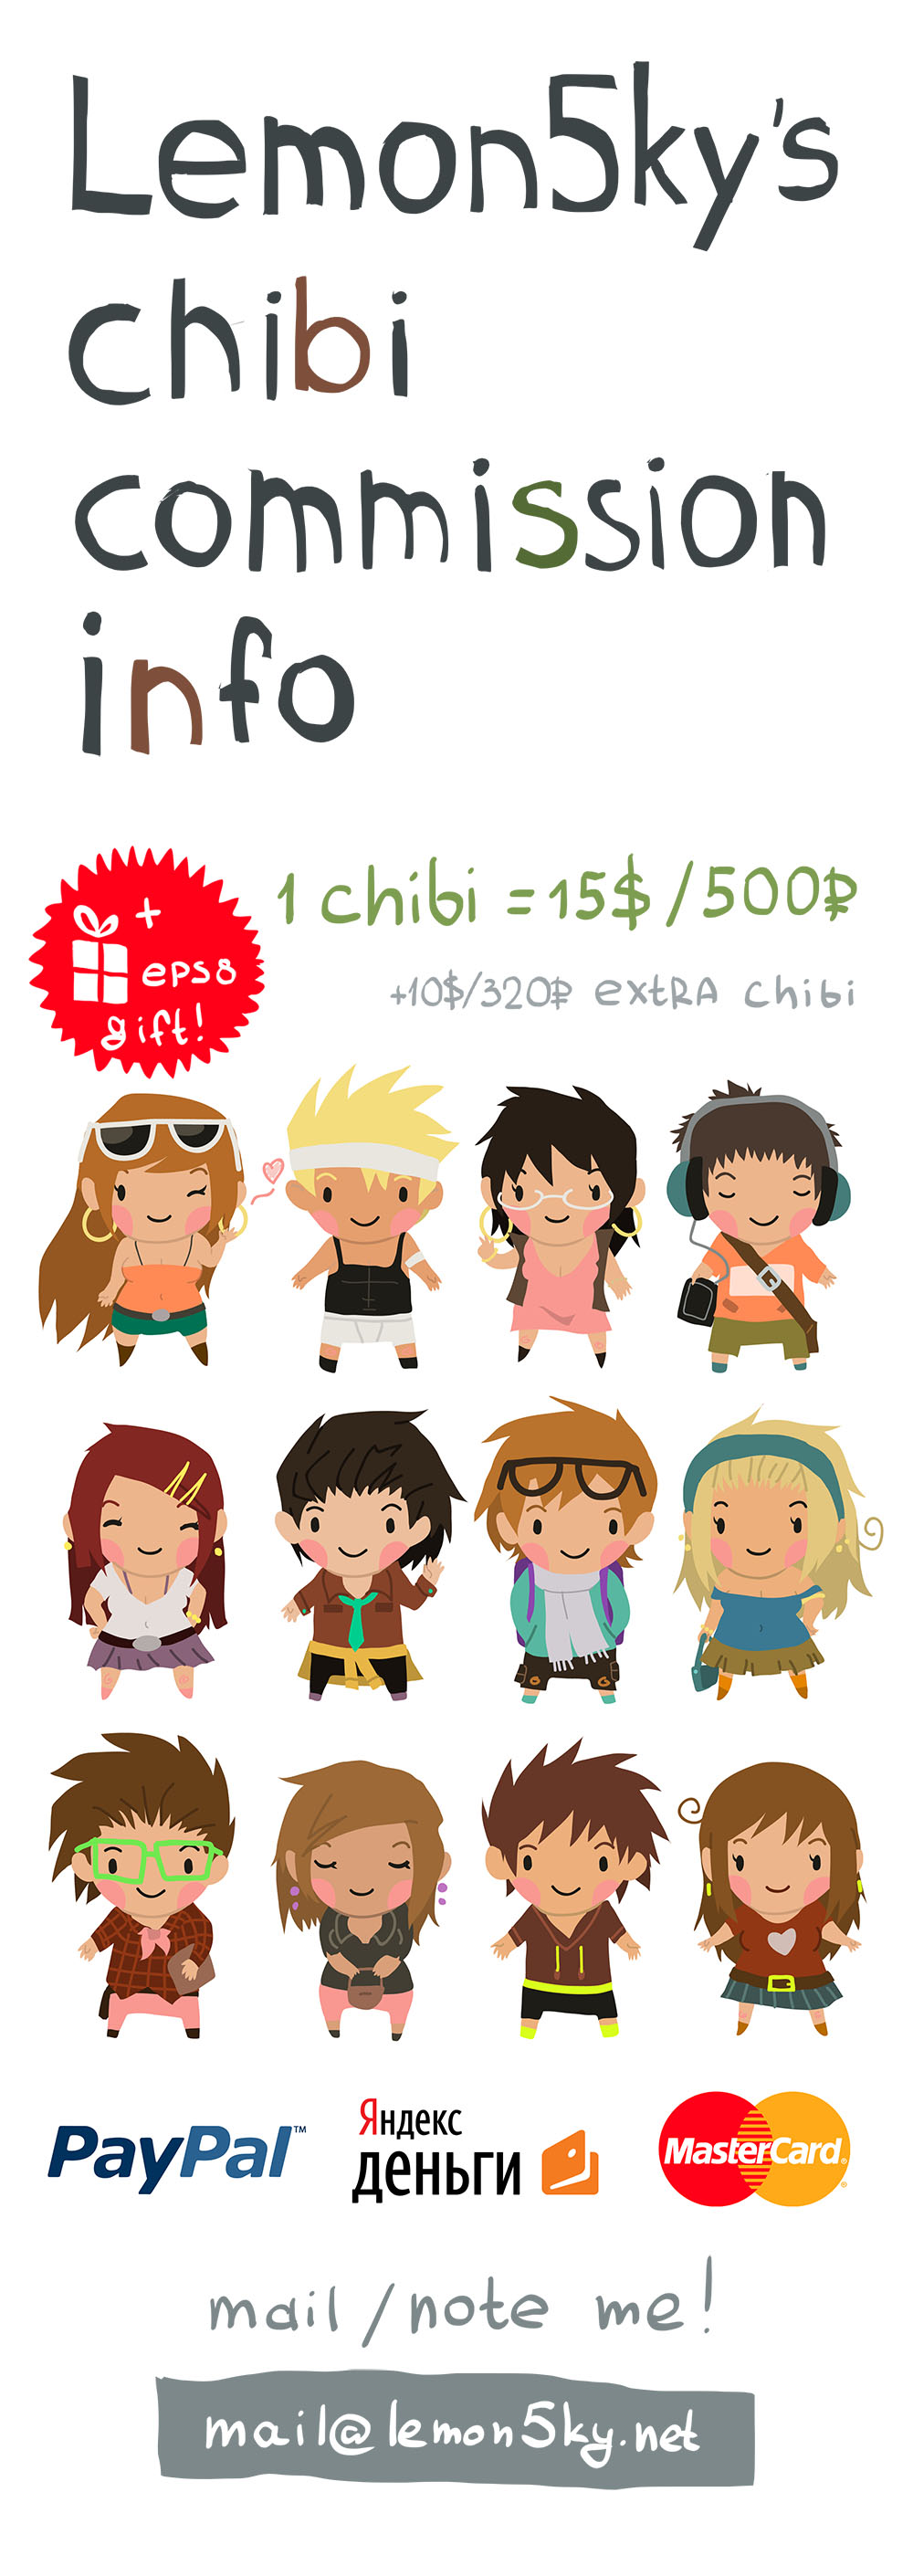 Chibi Commission by lemon5ky